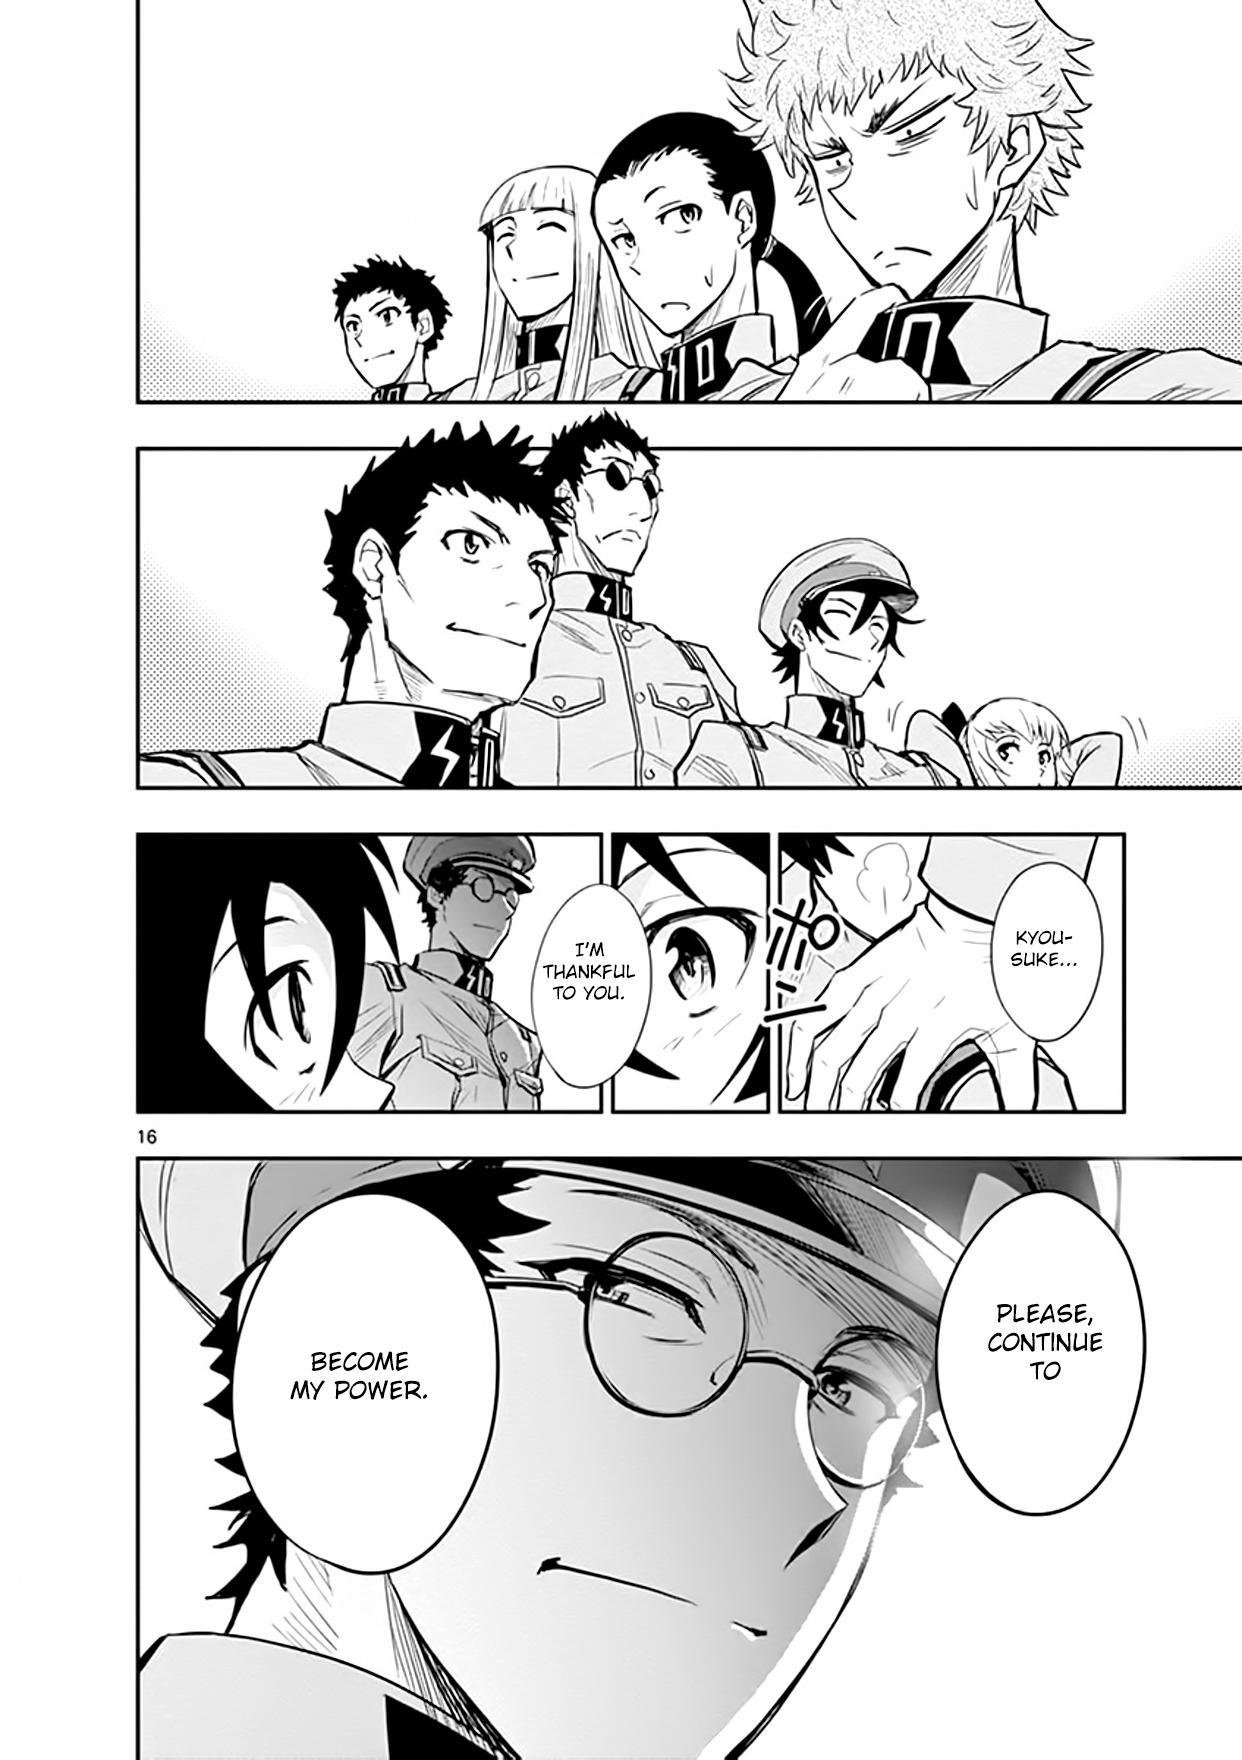 Zettai Karen Children: The Unlimited - Hyoubu Kyousuke Best Selection Vol.2 Ch.17